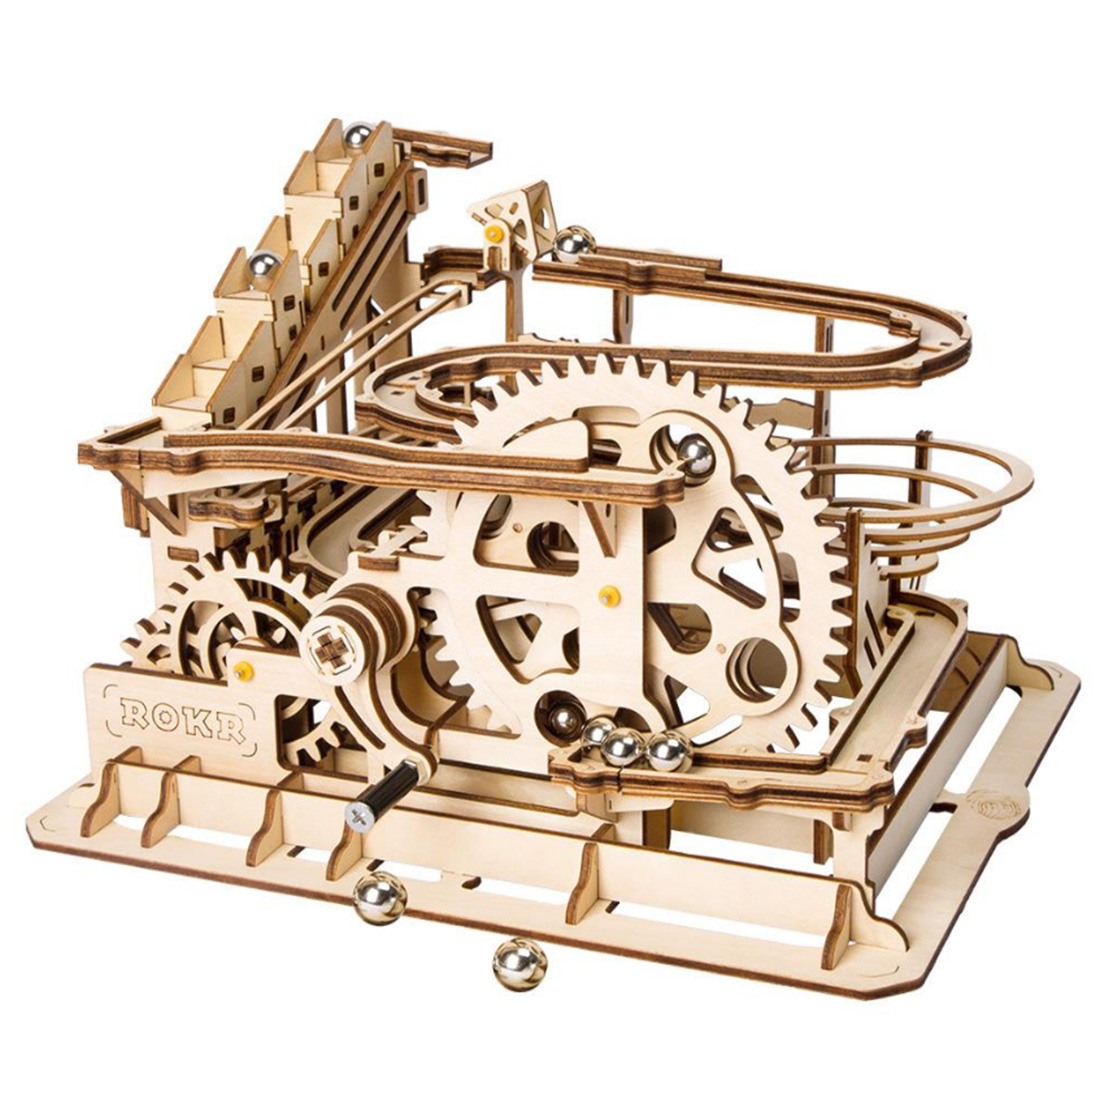 NFSTRIKE Waterwheel Coaster Shape 3D Painting Puzzle DIY Assemble Stem Puzzles Toys for Kids Children Boys